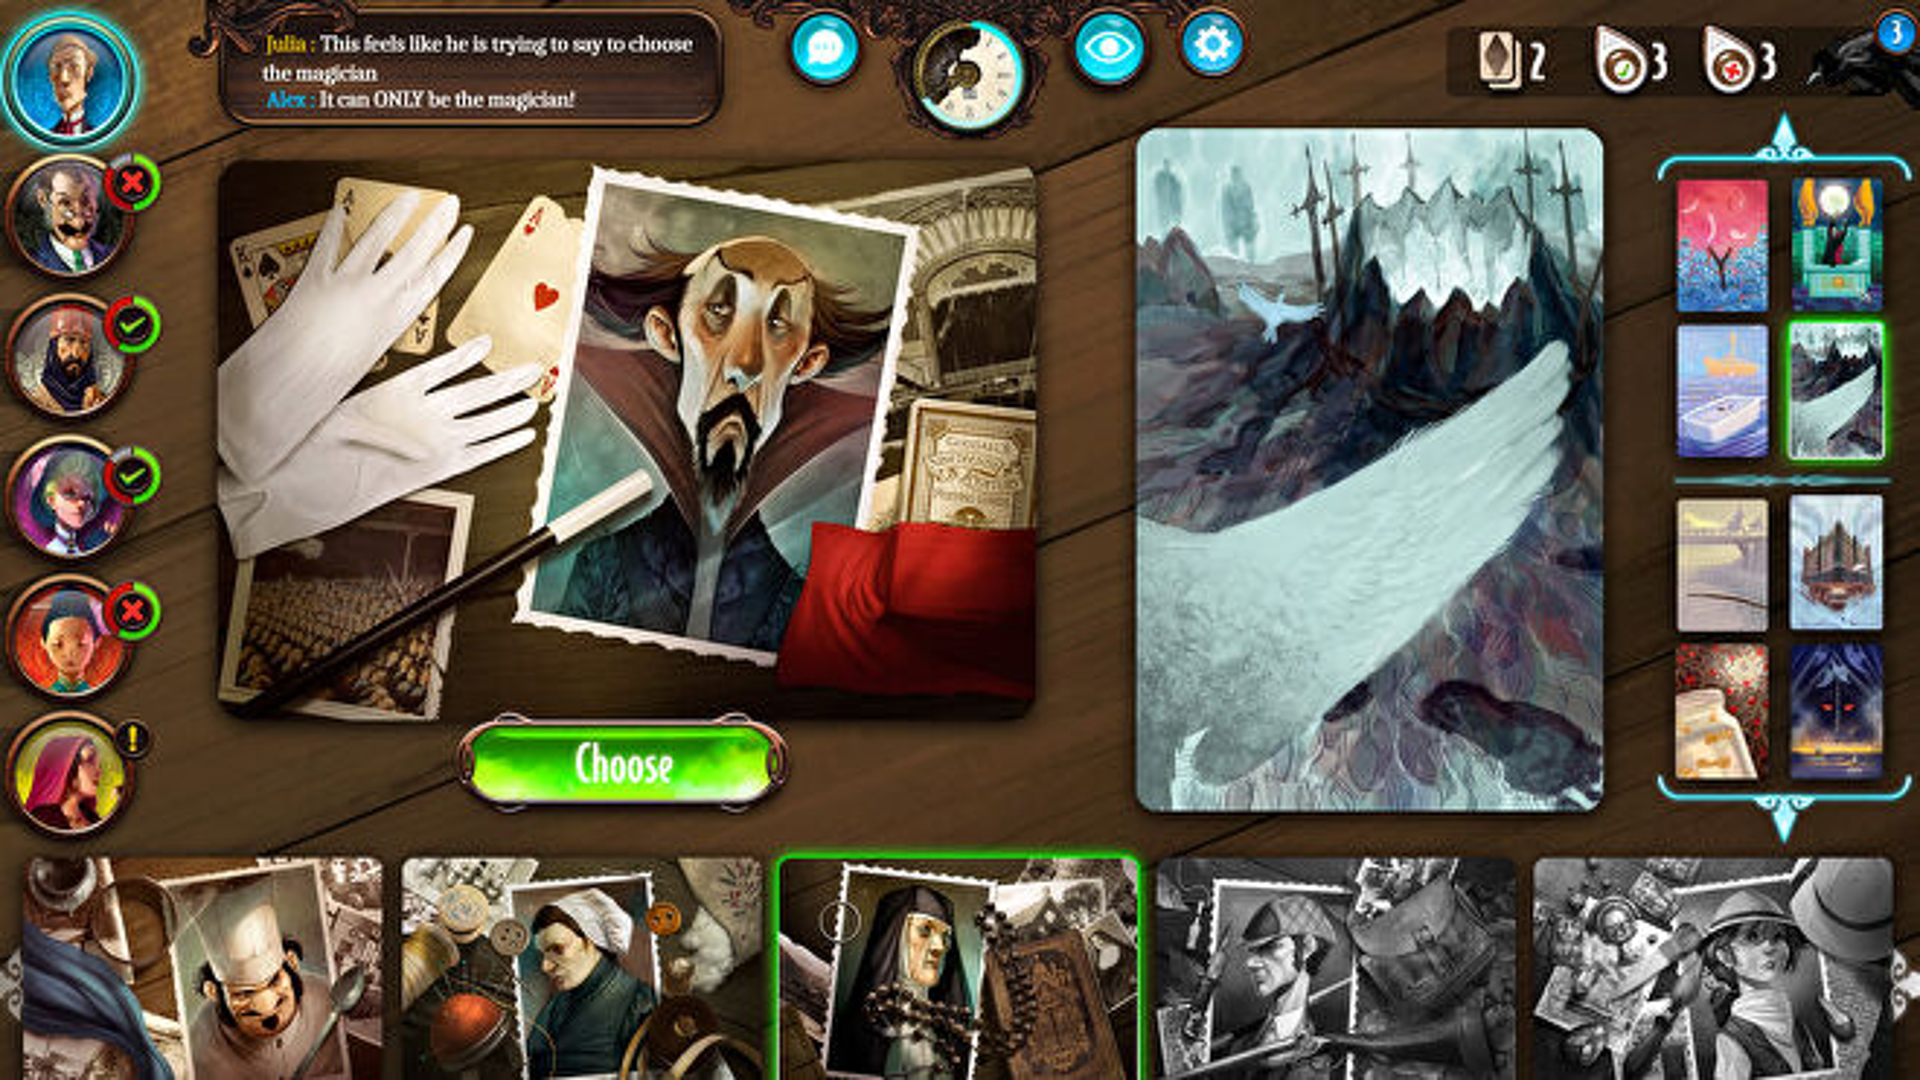 Mysterium digital board game screenshot